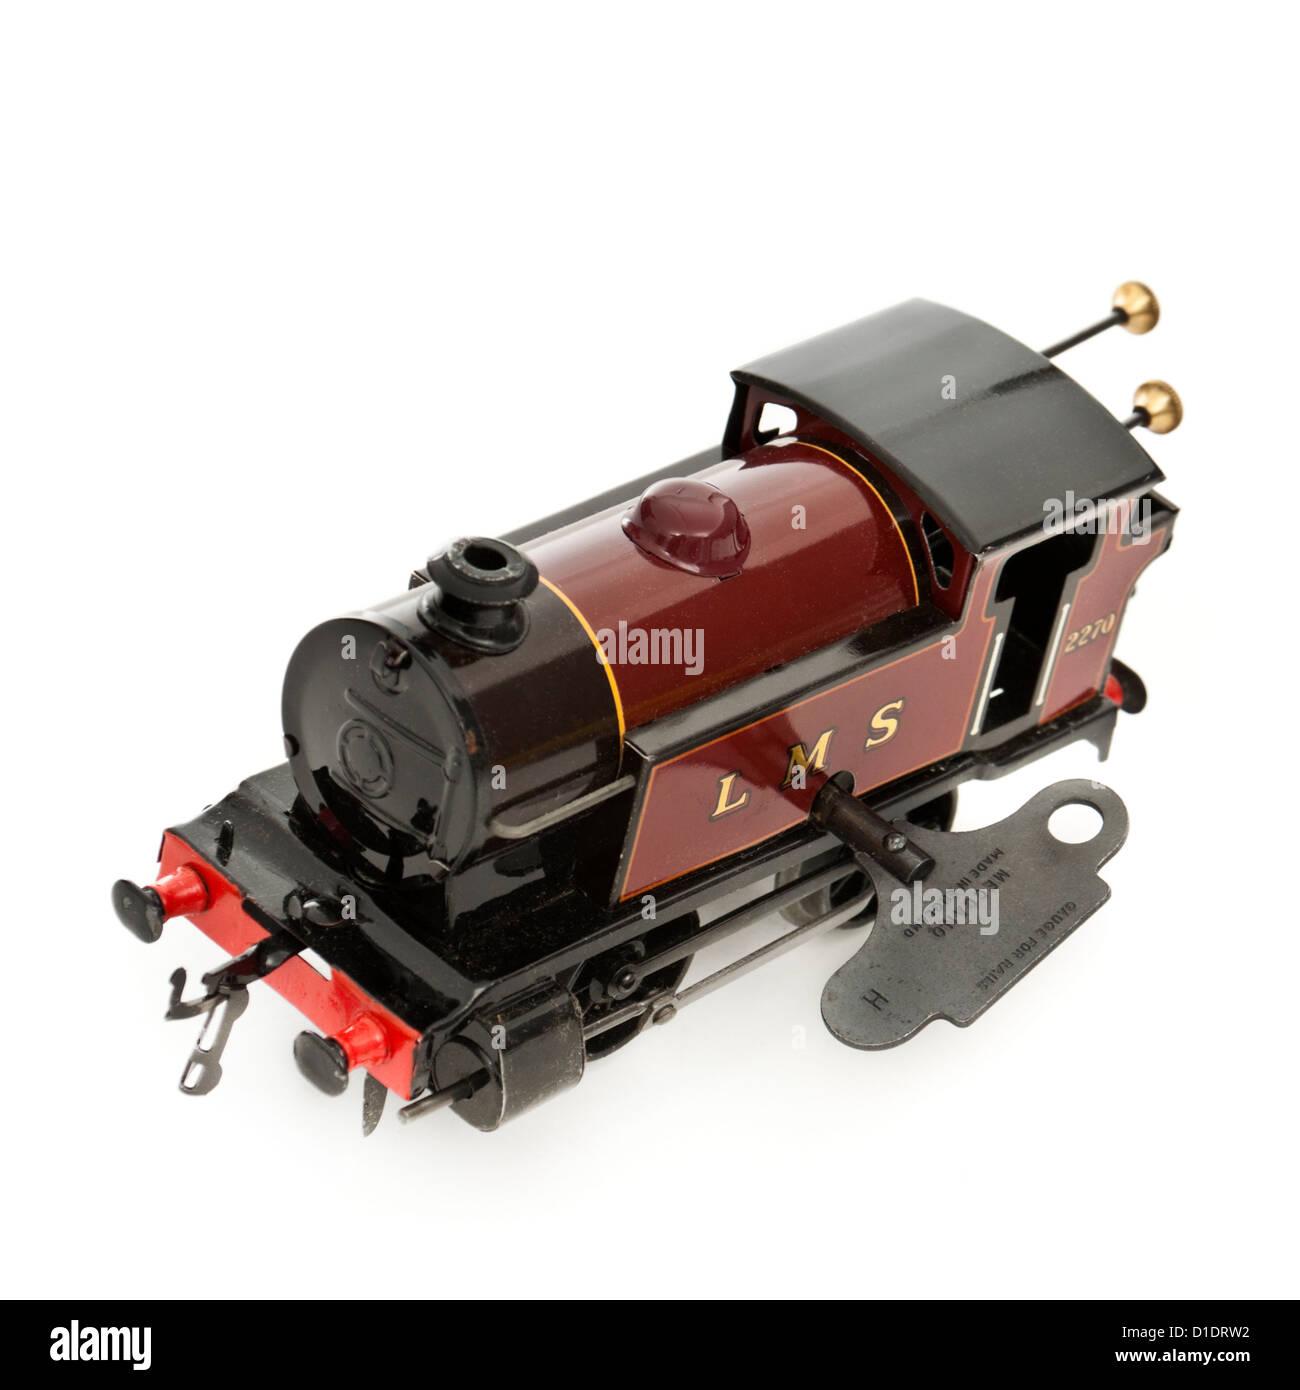 Rare 1950's Hornby (Meccano) clockwork tinplate LMS locomotive (O-gauge) with running number 2270 - Stock Image